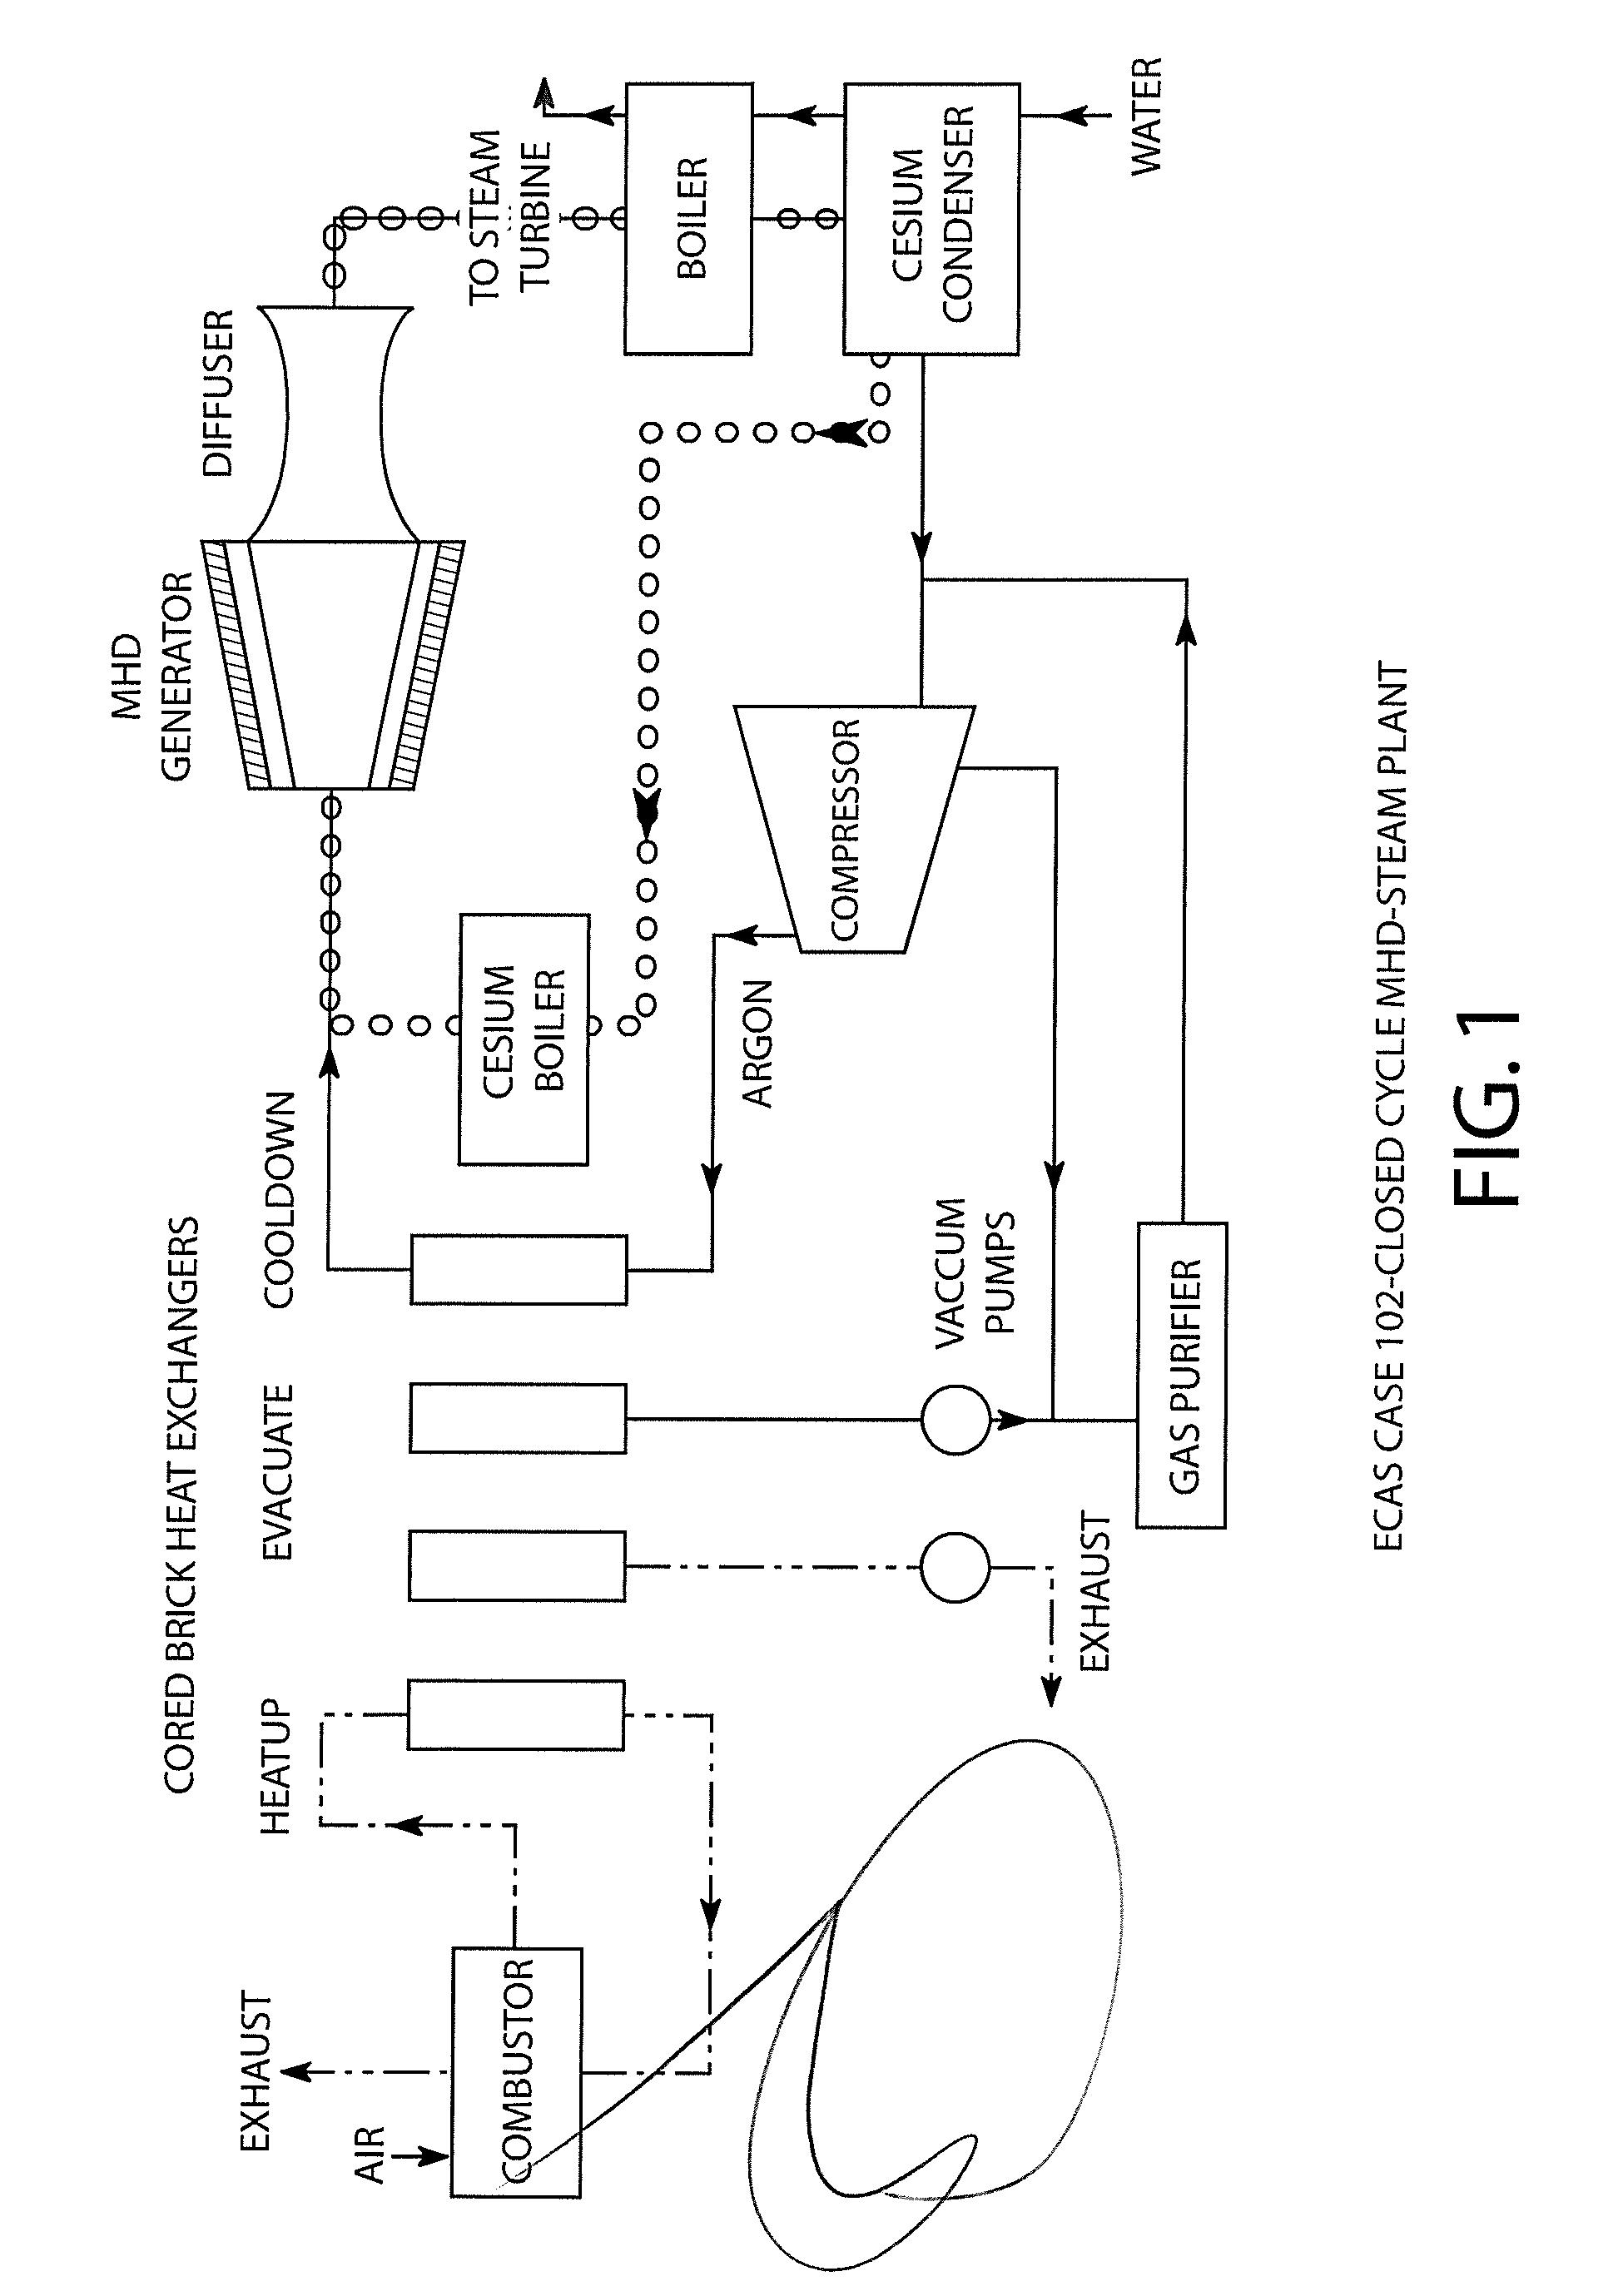 Mhd Power Plant Diagram